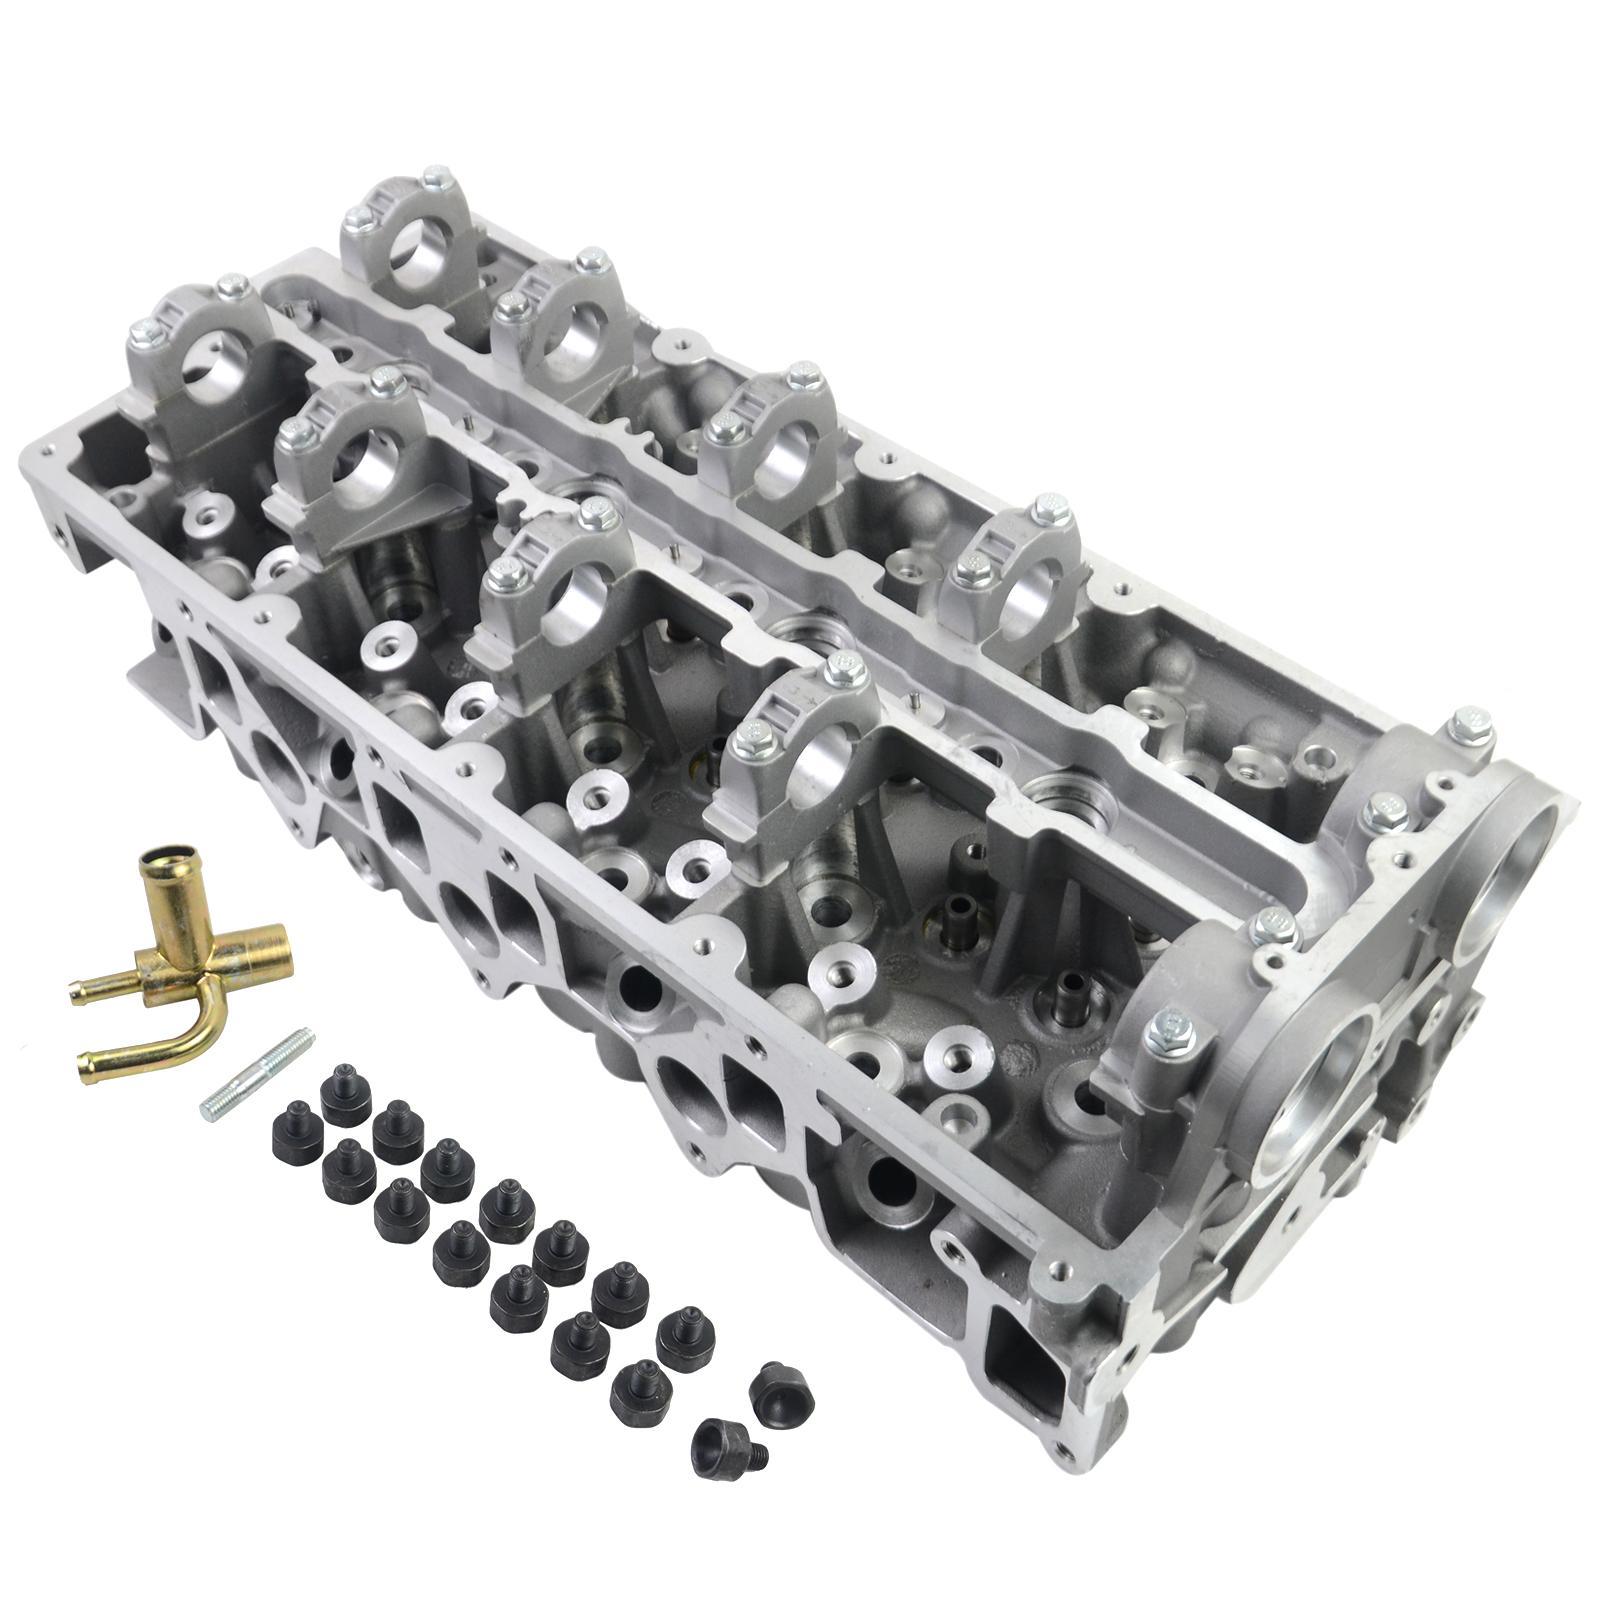 Cabezal de cilindro AP03 para Ford Ranger, para Mazda BT50 Pick-up 3,0,...